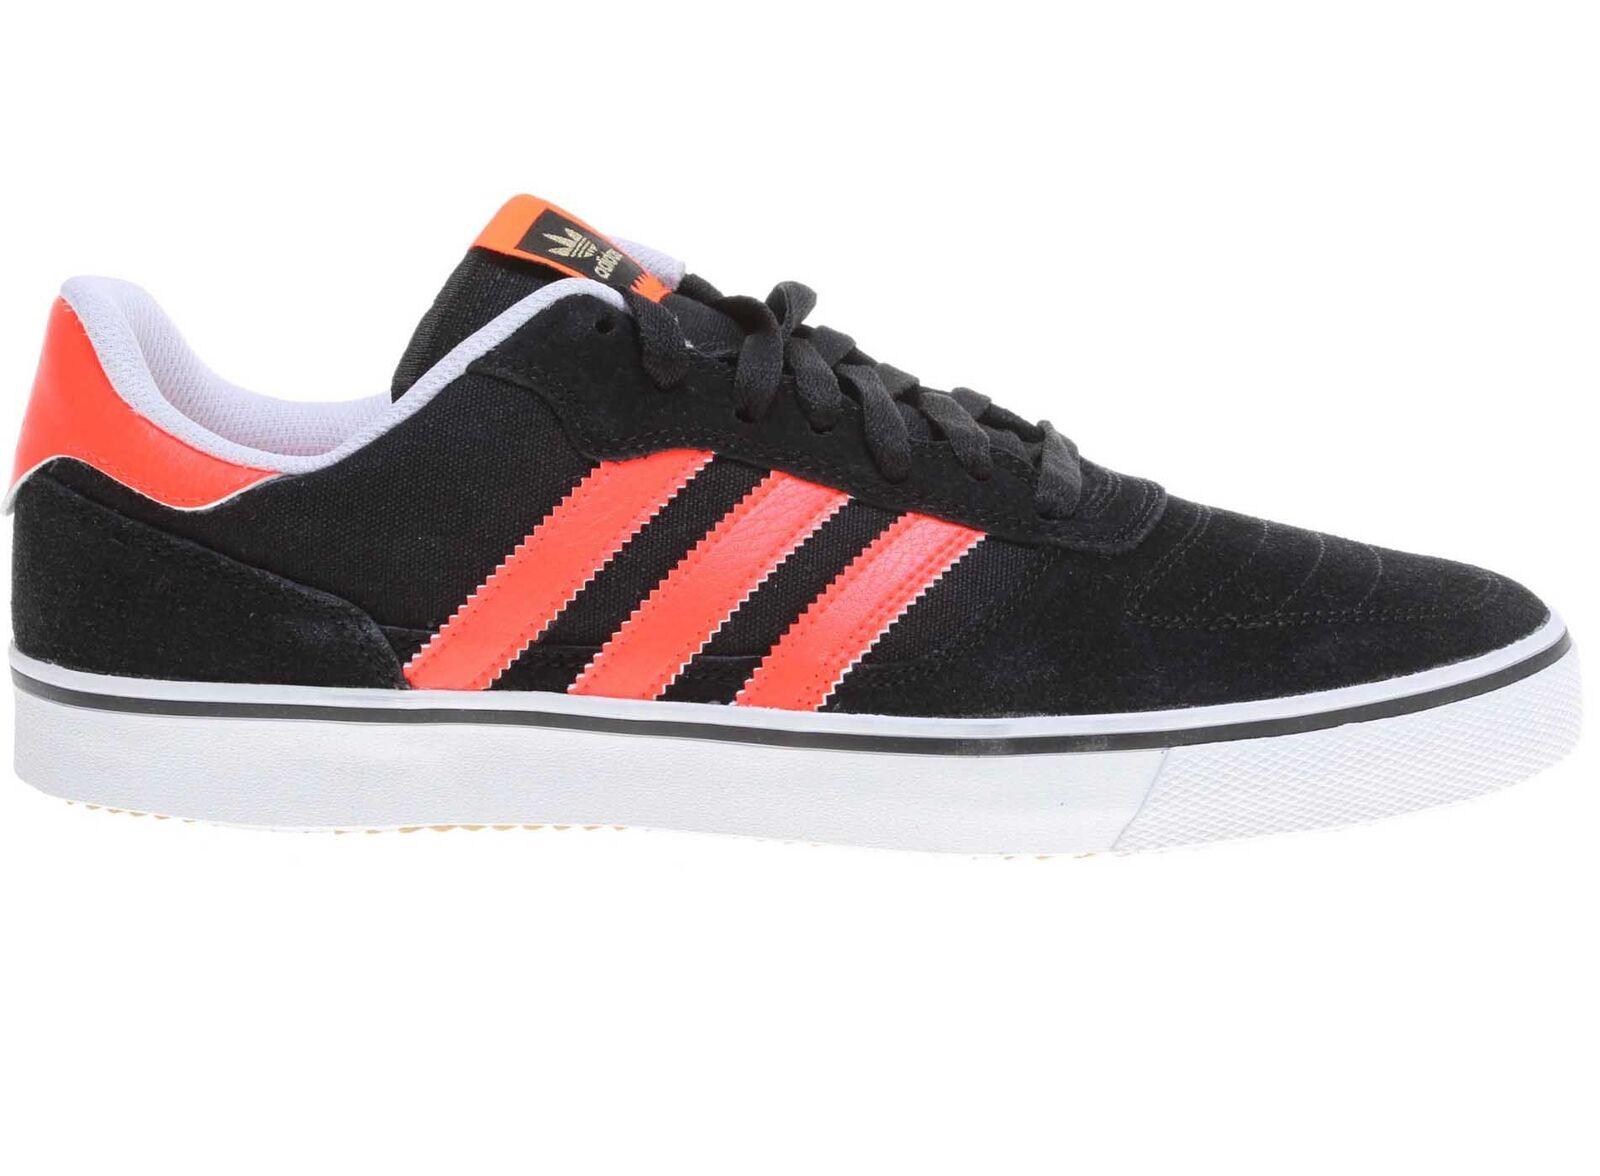 Adidas Copa Vulc C76994 Originals Turnschuhe Turnschuhe Turnschuhe Herren schwarz rot  59 95 8d9391